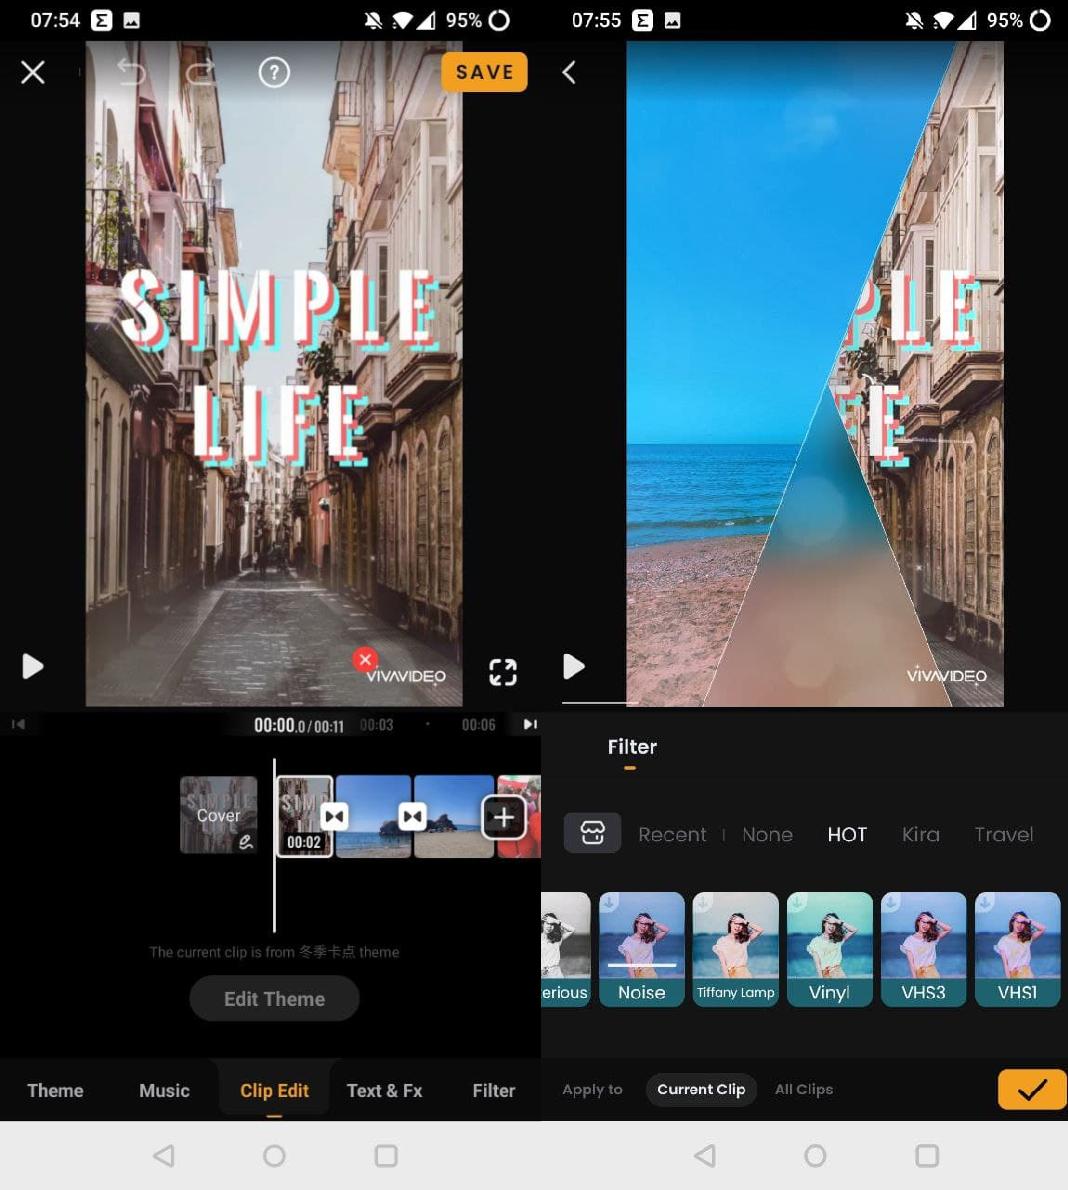 vivavideo-filters